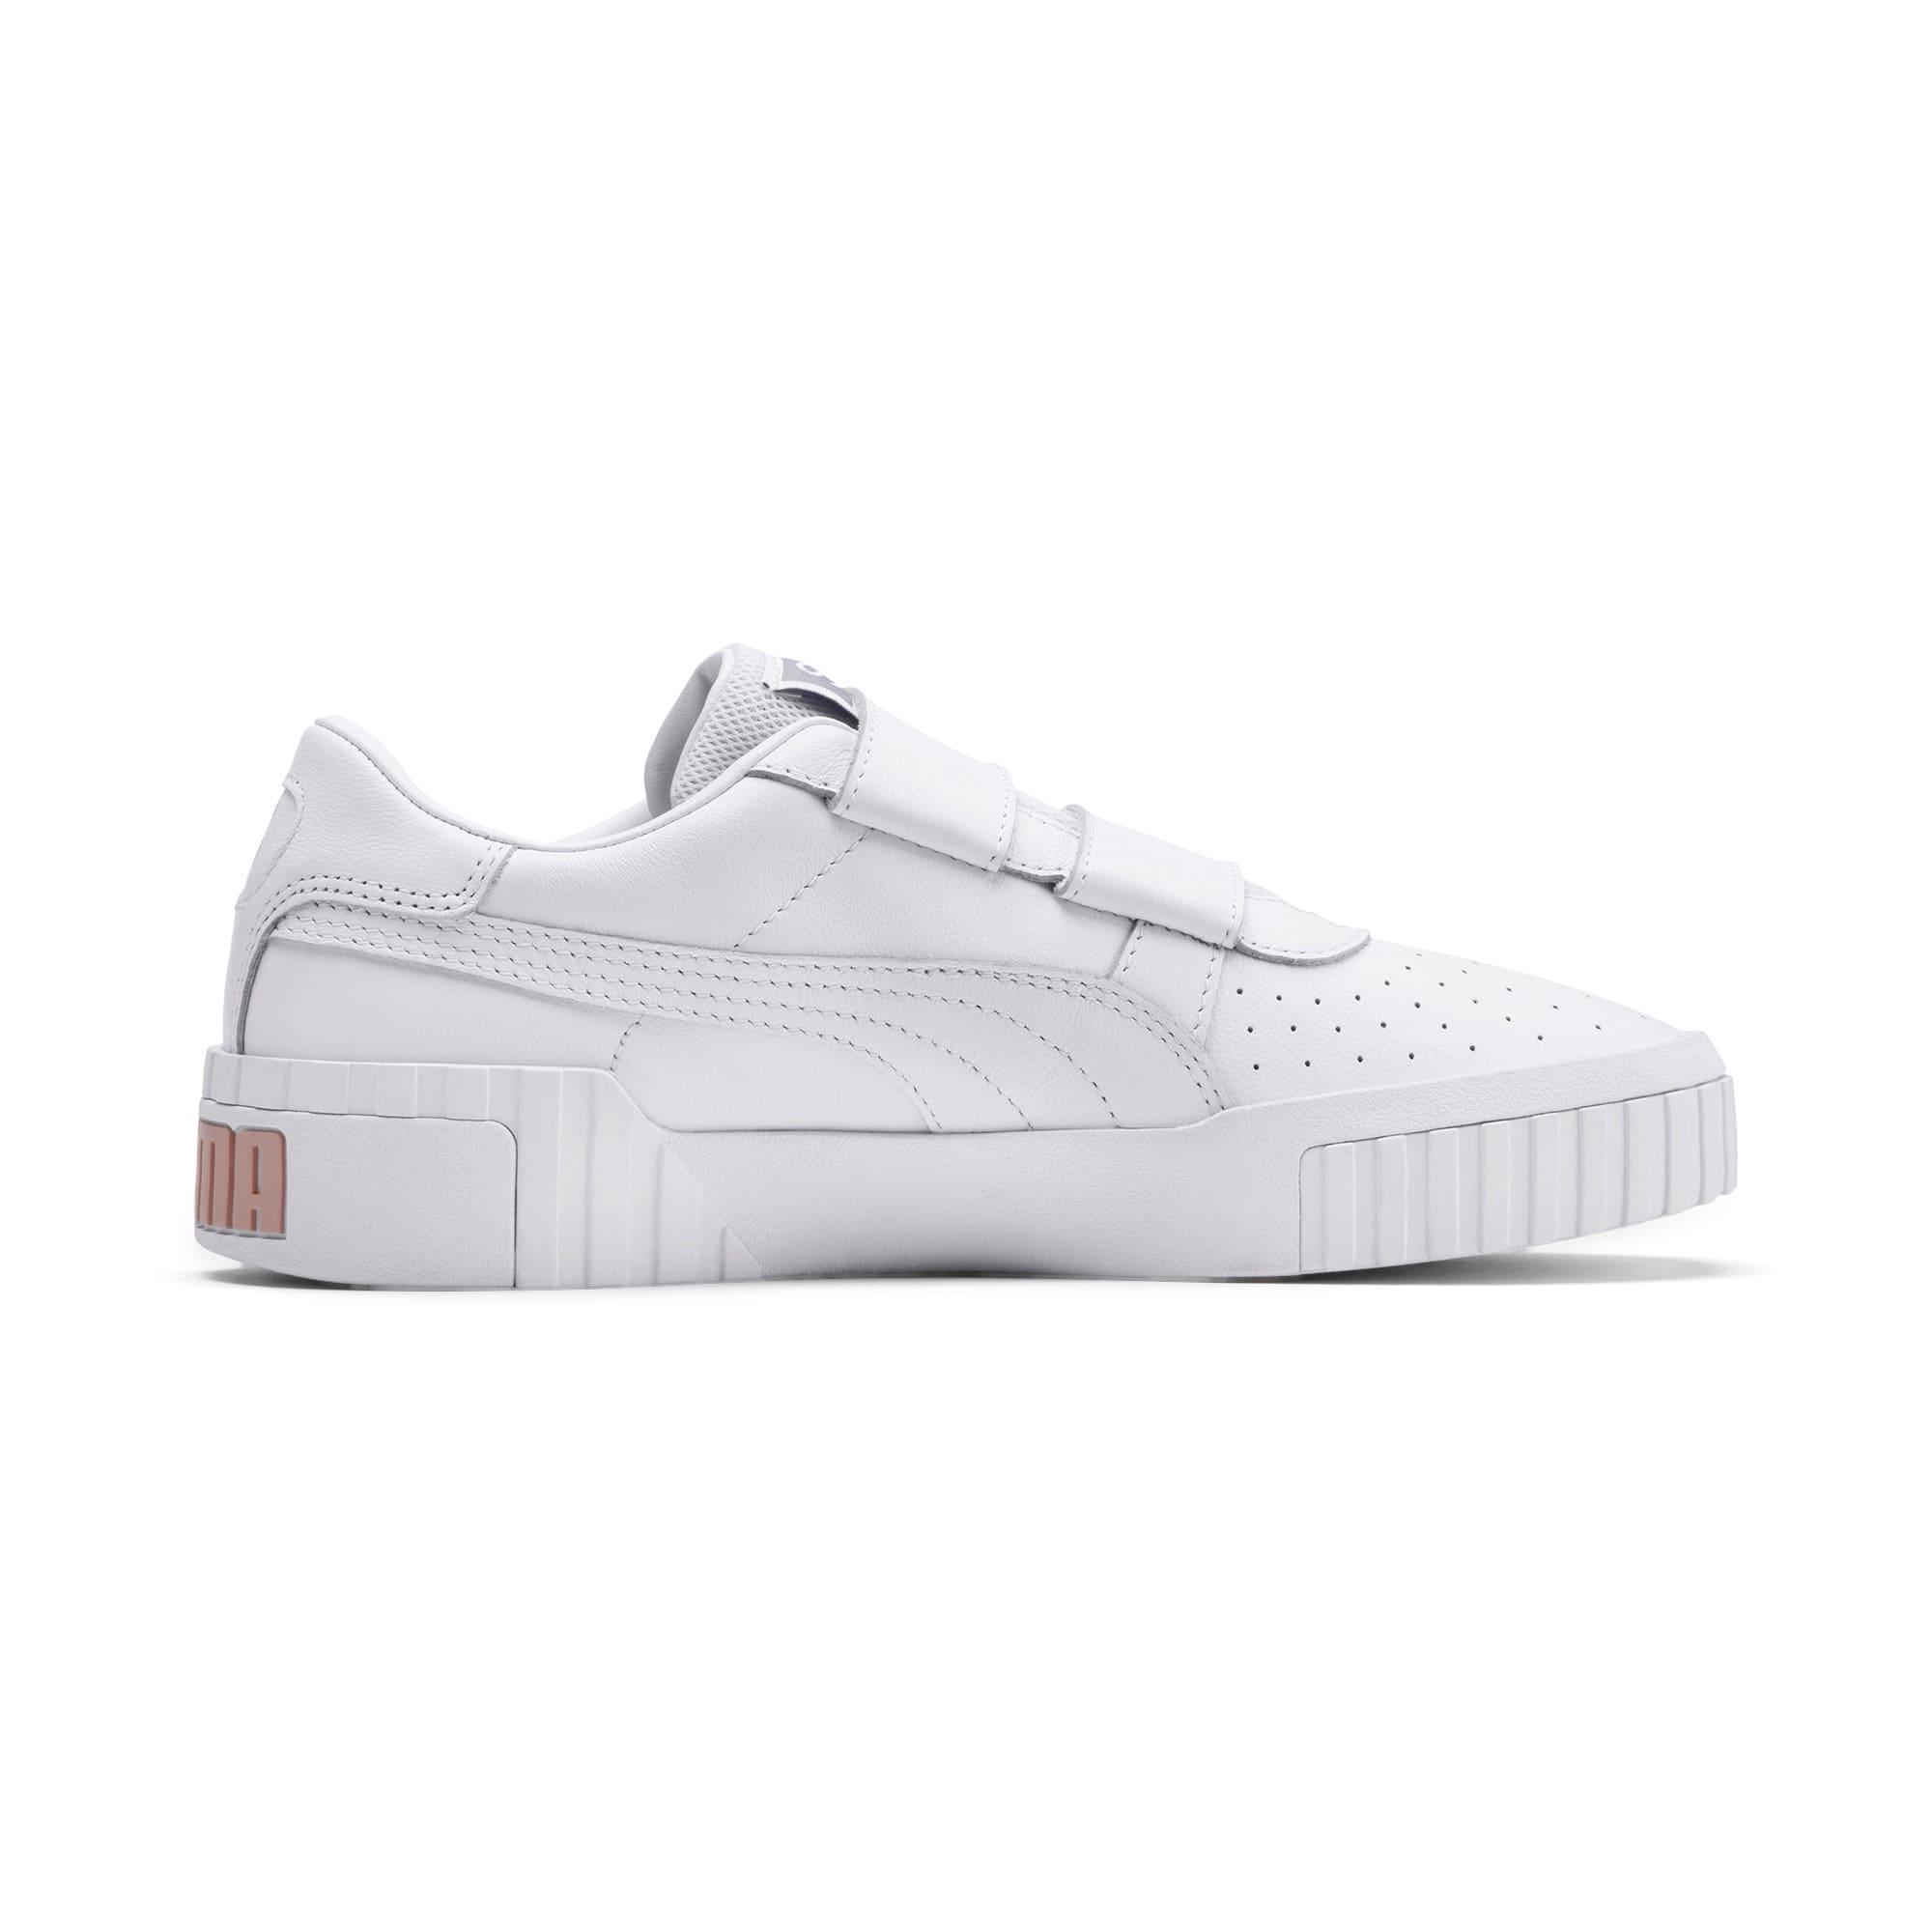 Thumbnail 6 of SG x Cali Women's Sneakers, Puma White-Puma White, medium